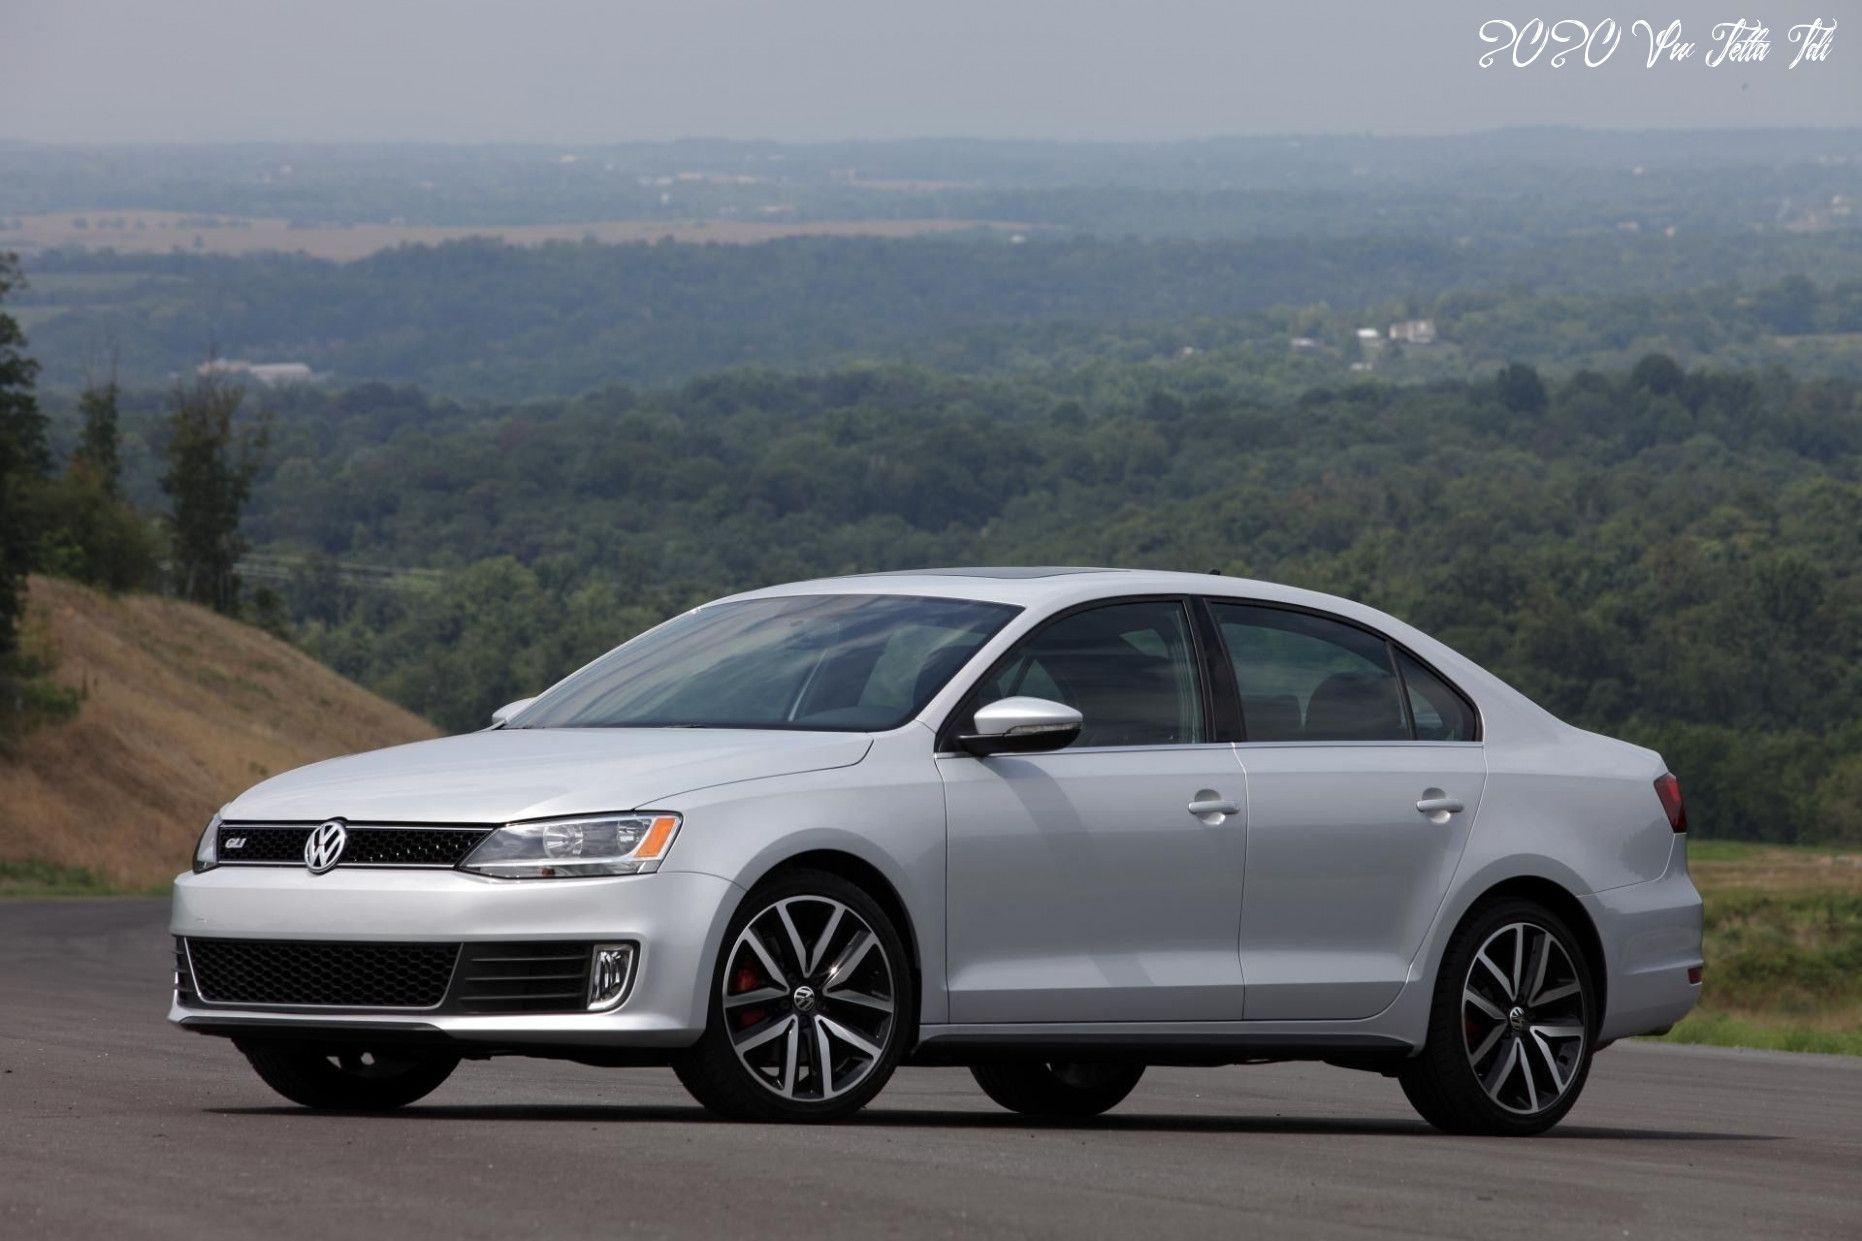 2020 Vw Jetta Tdi Price And Release Date In 2020 Volkswagen Jetta Jetta Gli Jetta Tdi